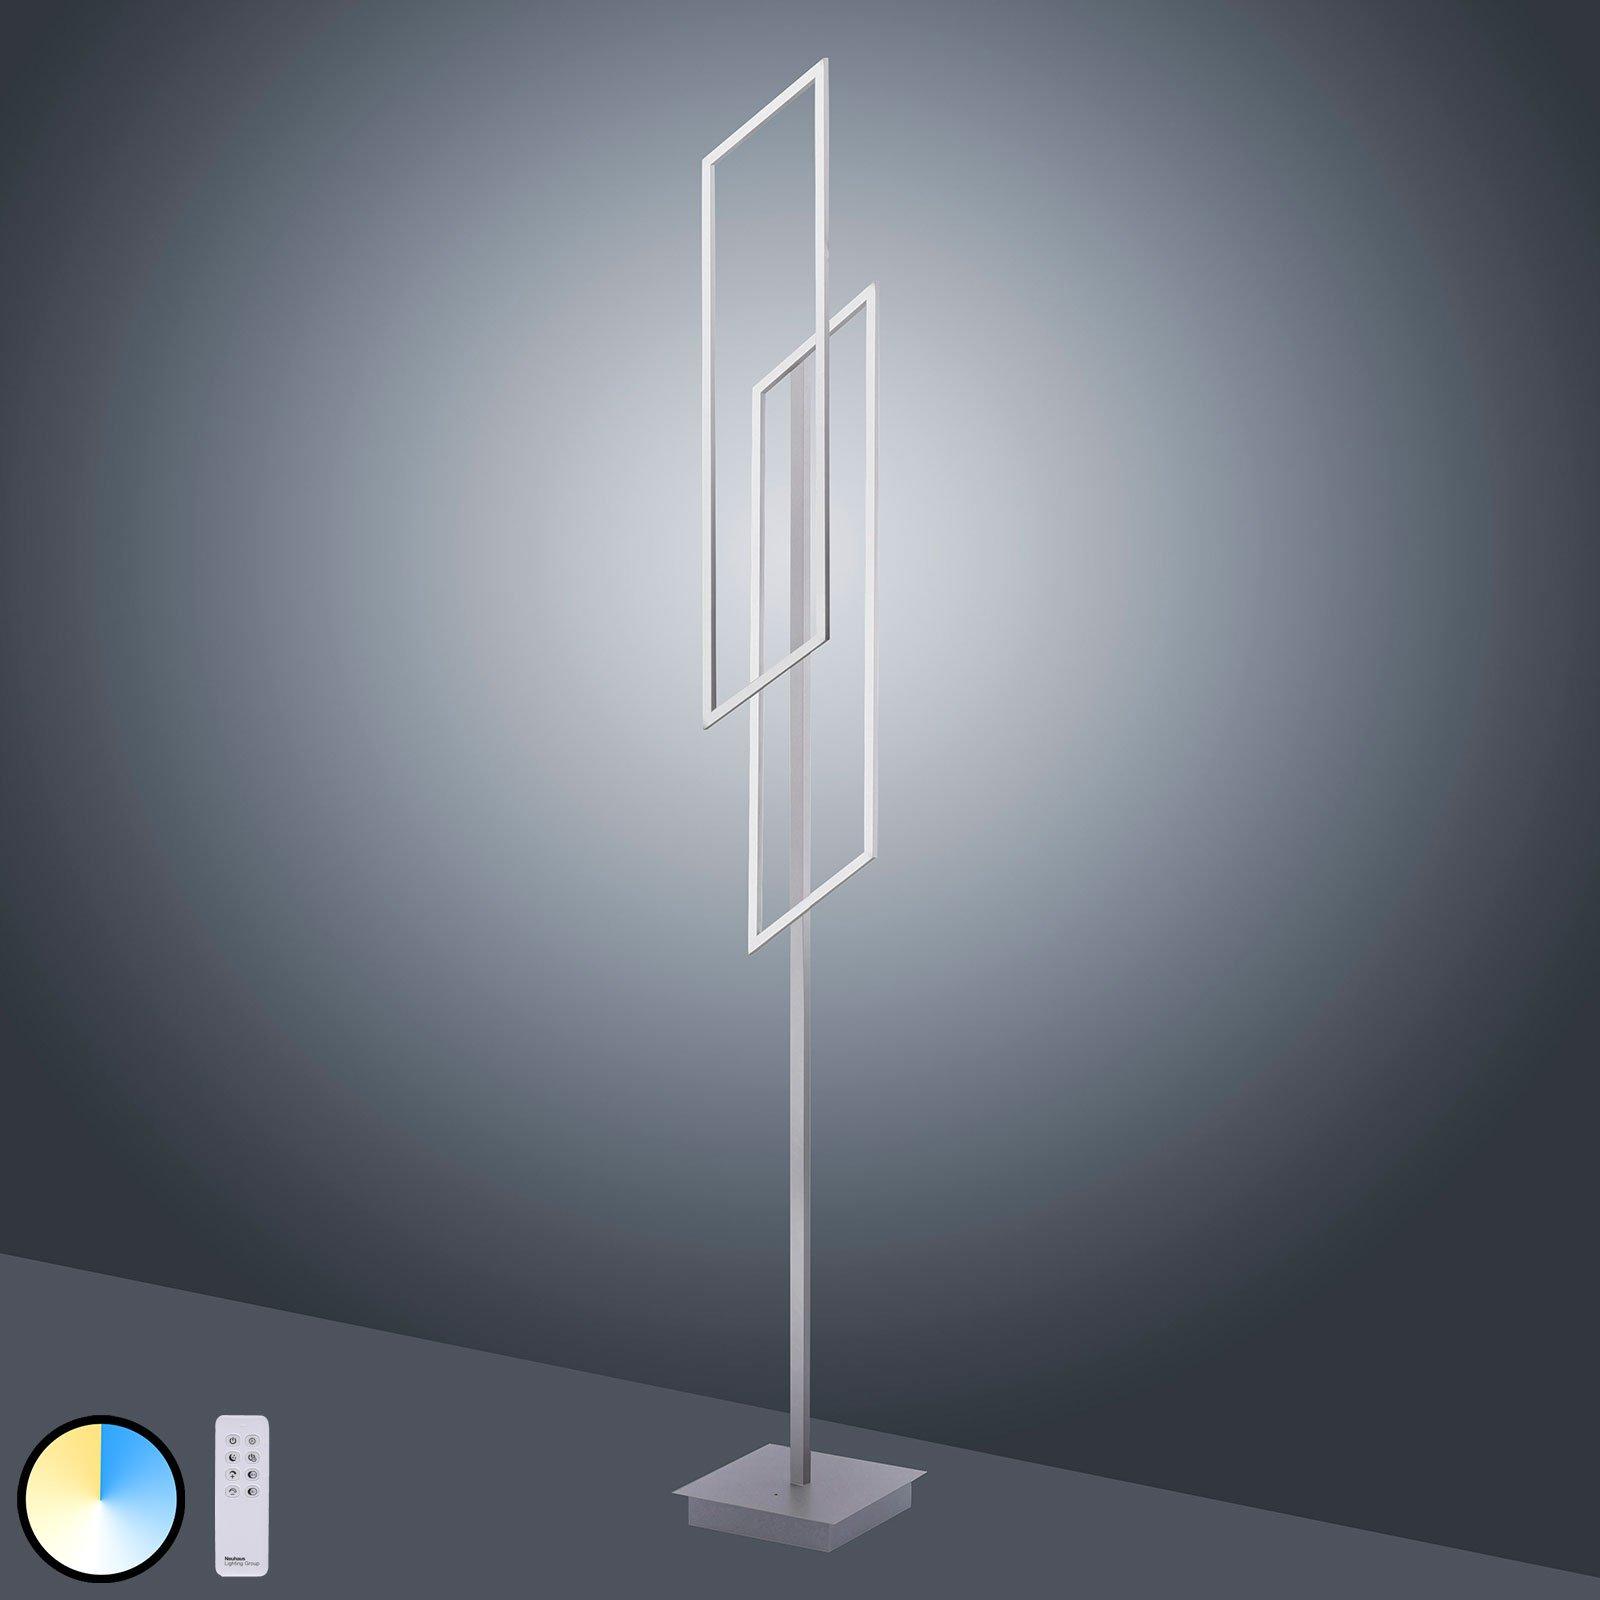 Paul Neuhaus Inigo LED-gulvlampe CCT, 2 lyskilder